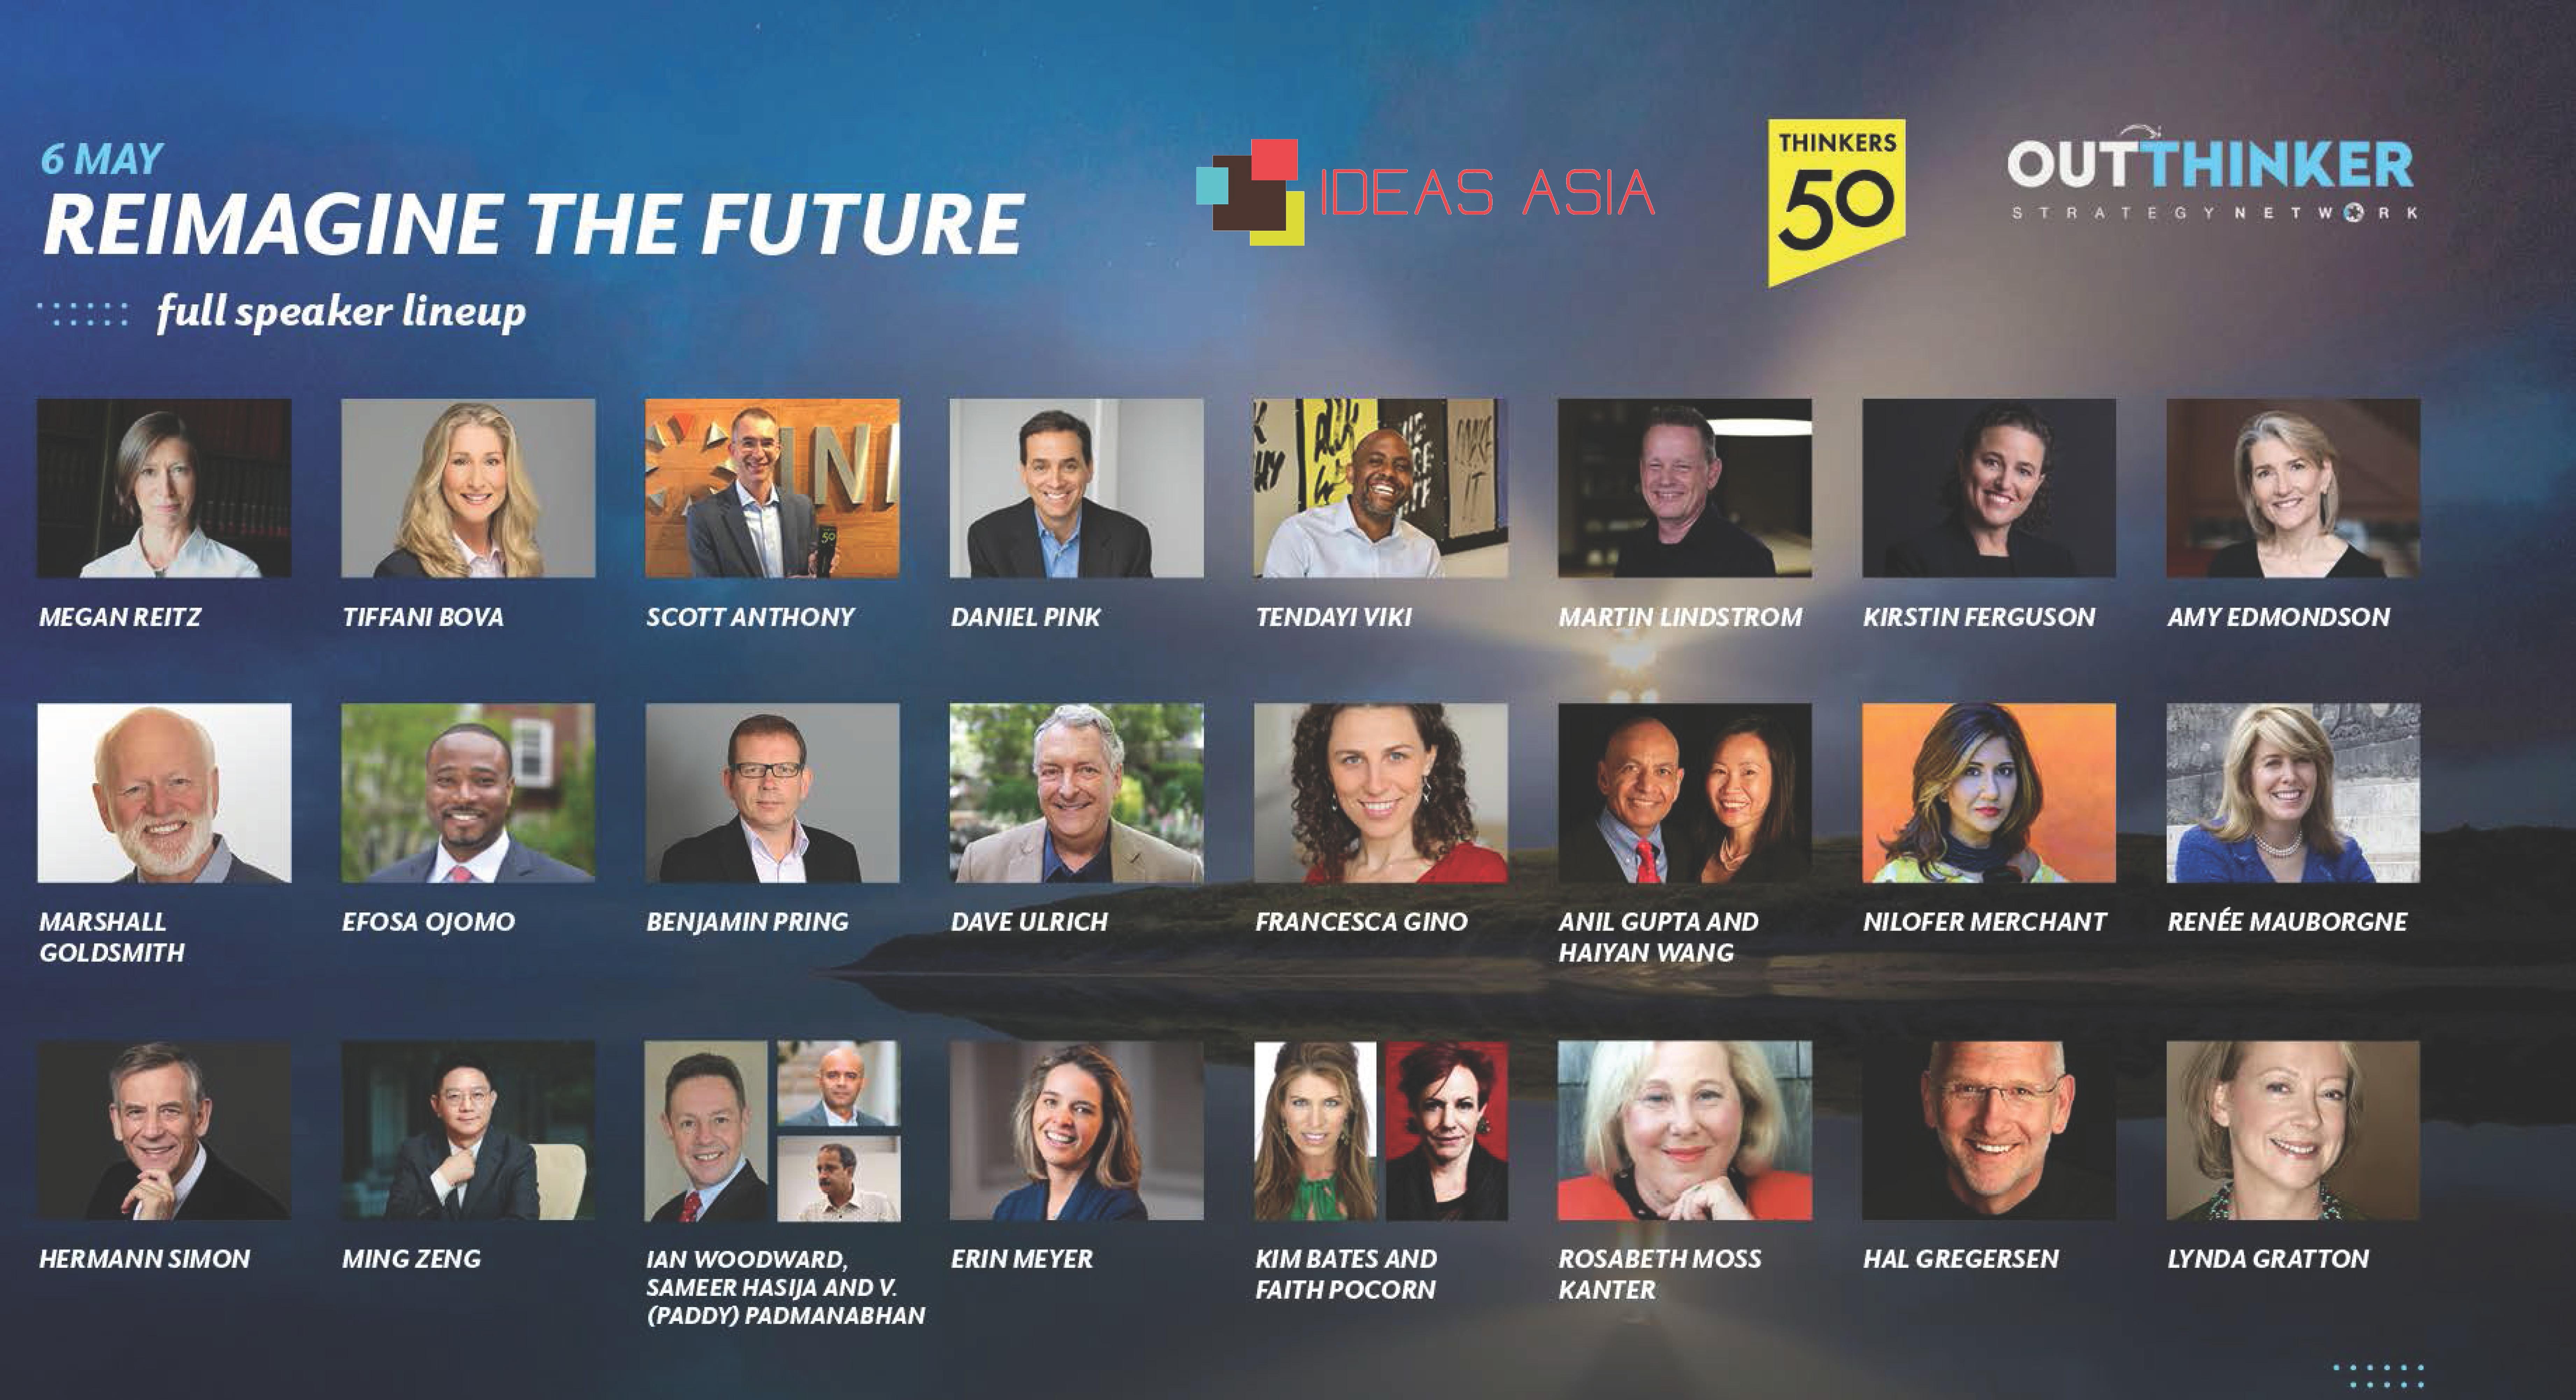 IDEAS ASIA - Thinkers50 Virtual Summit